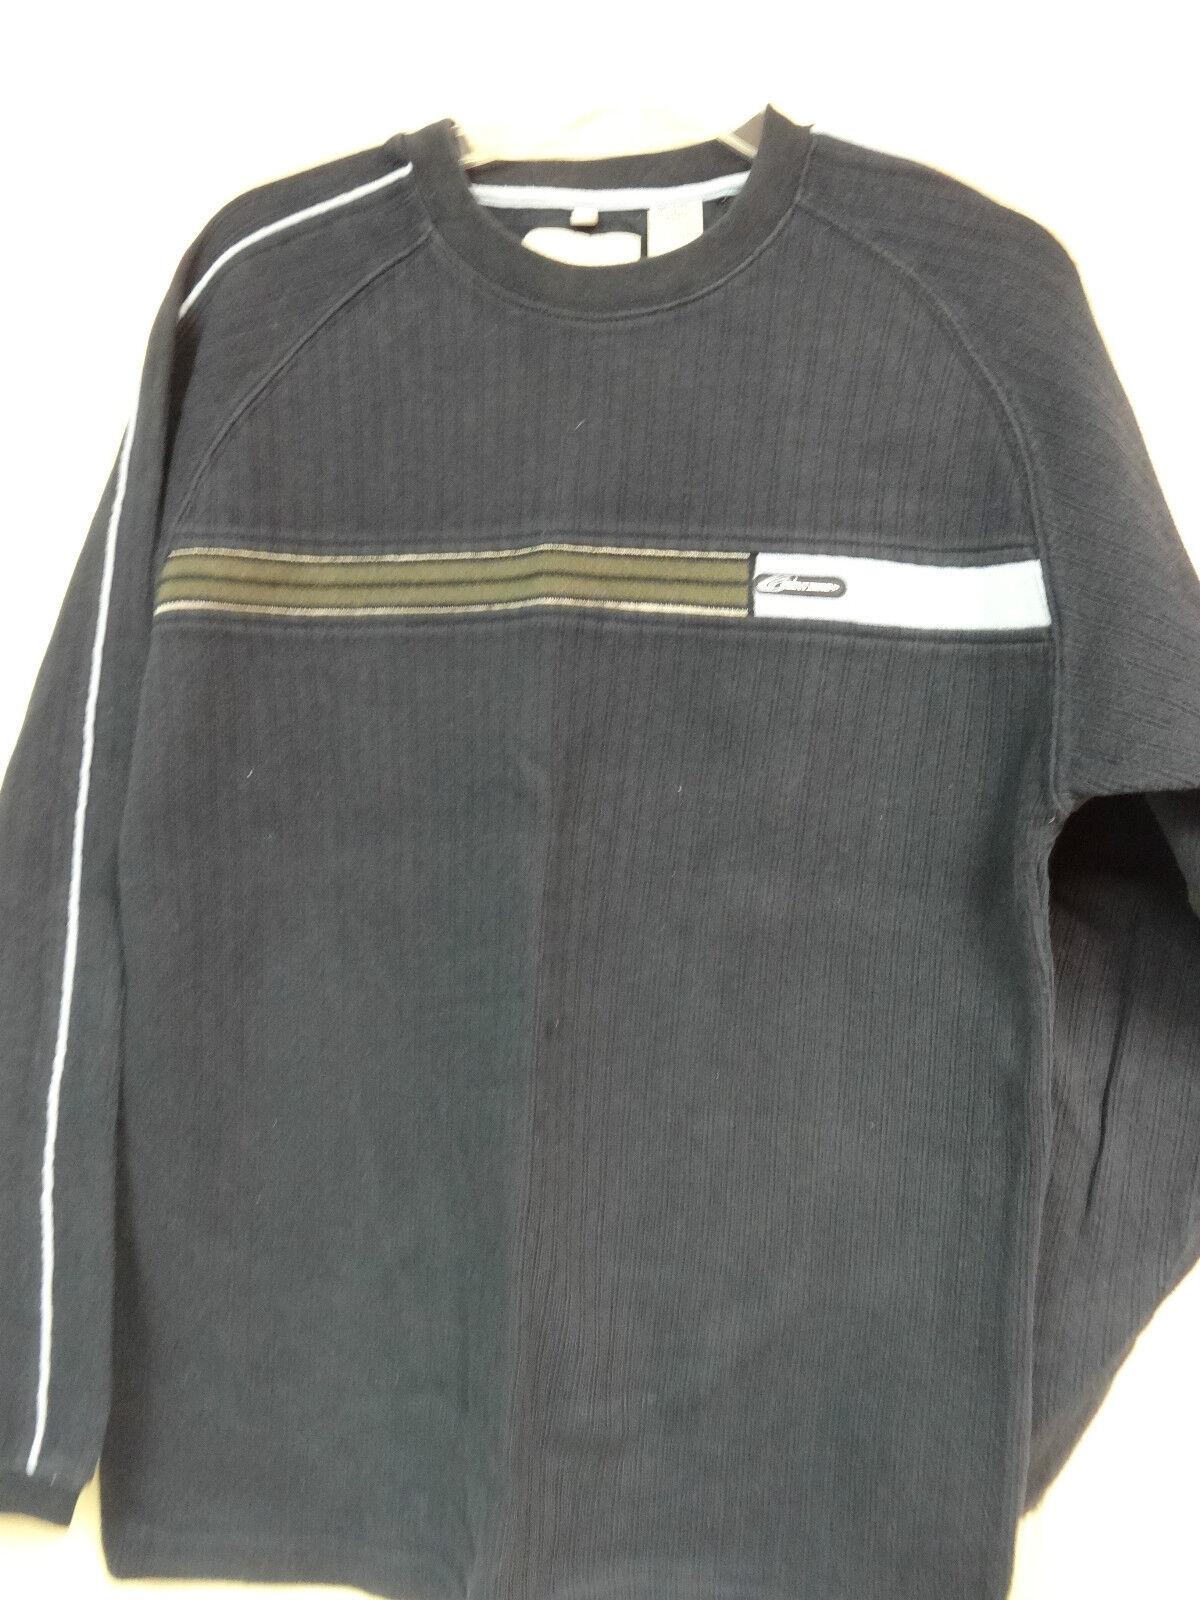 Men's POINT ZERO Long Sleeve Sweater Size Small bluee